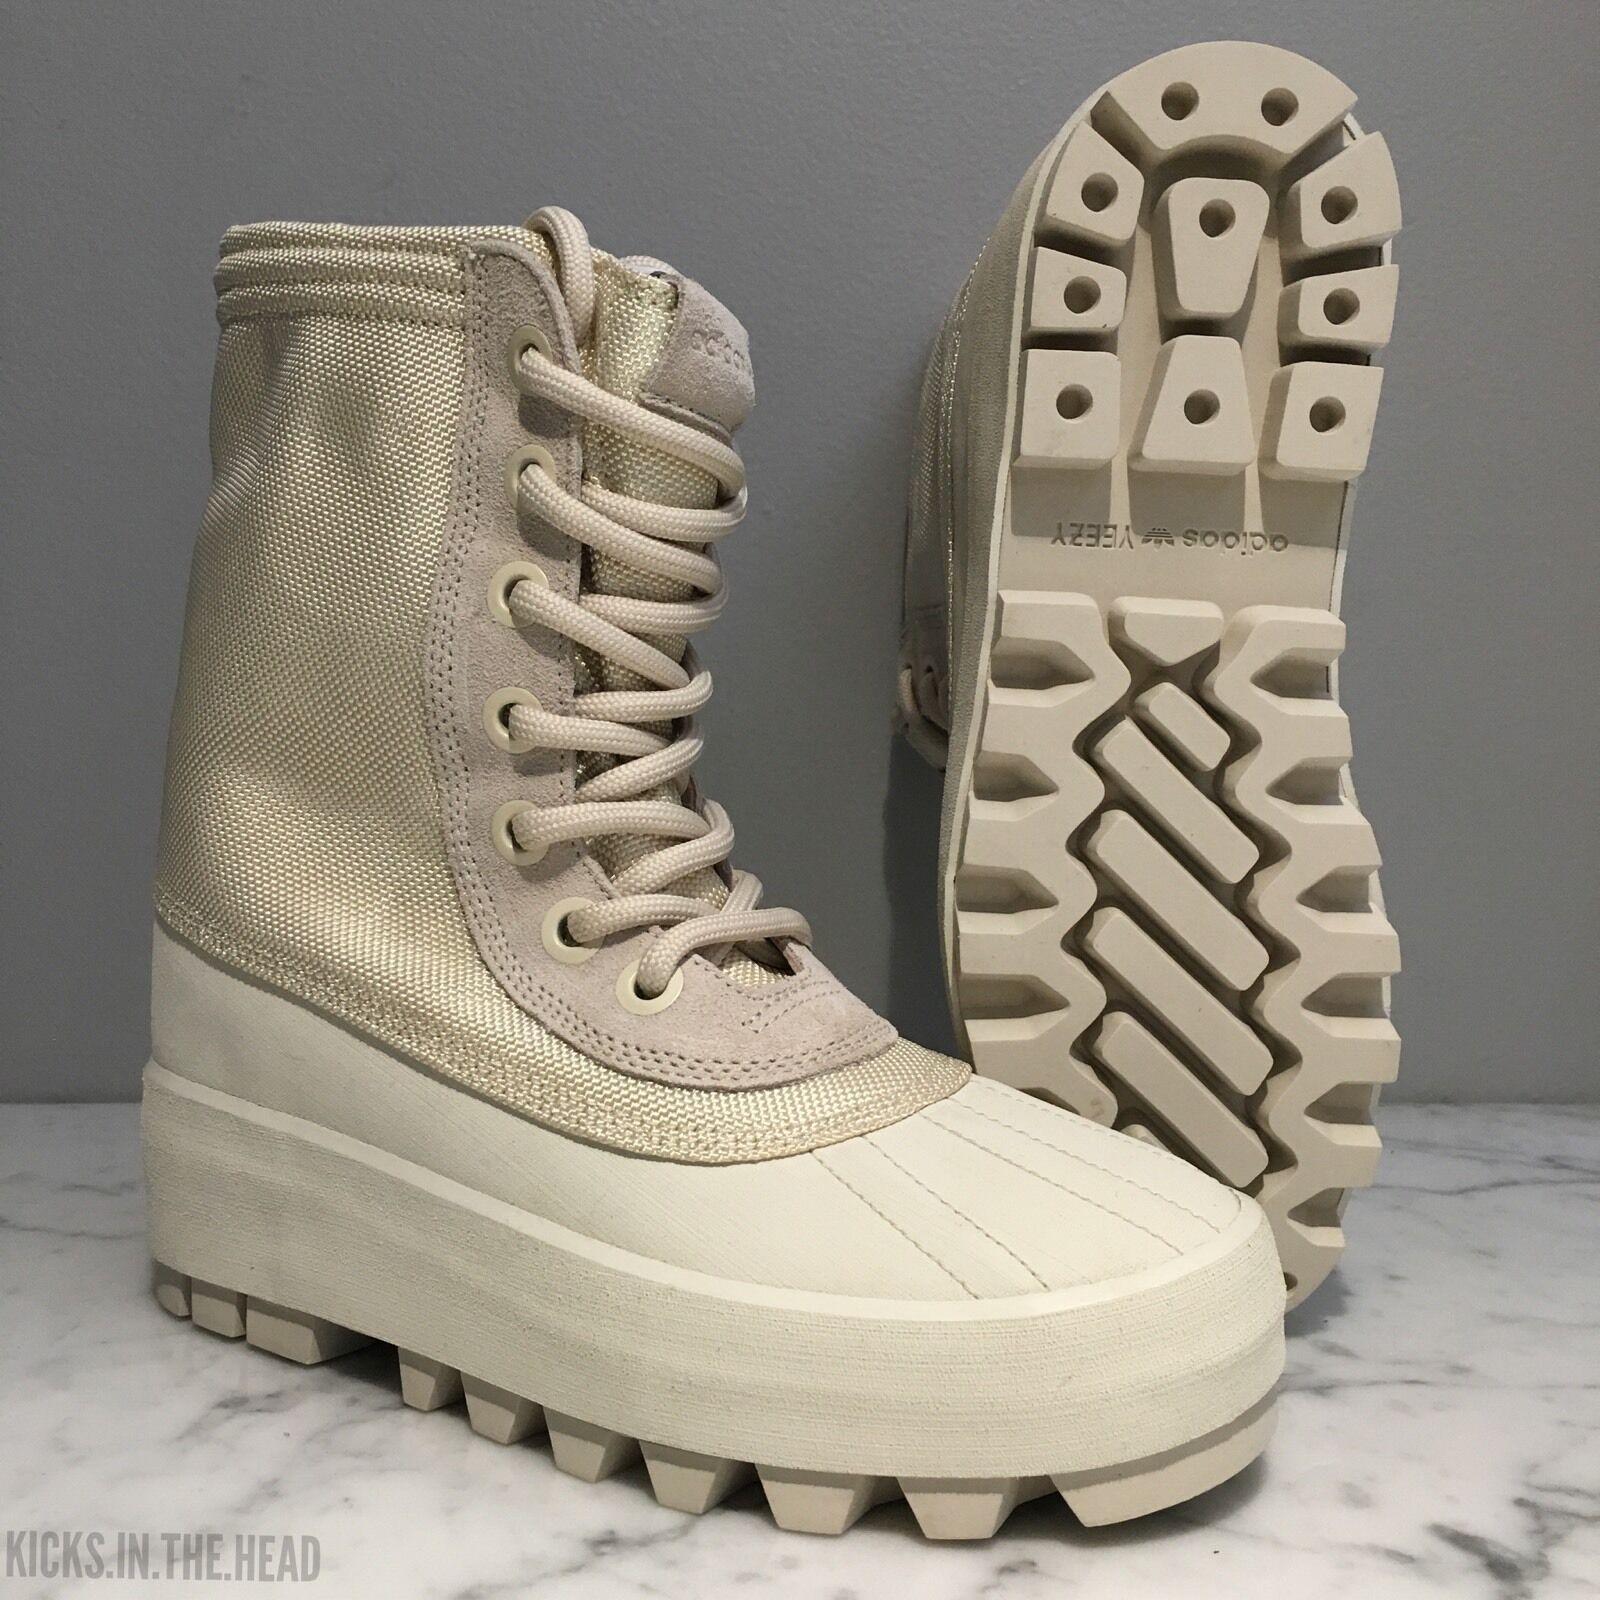 Adidas yeezy boot 950 w